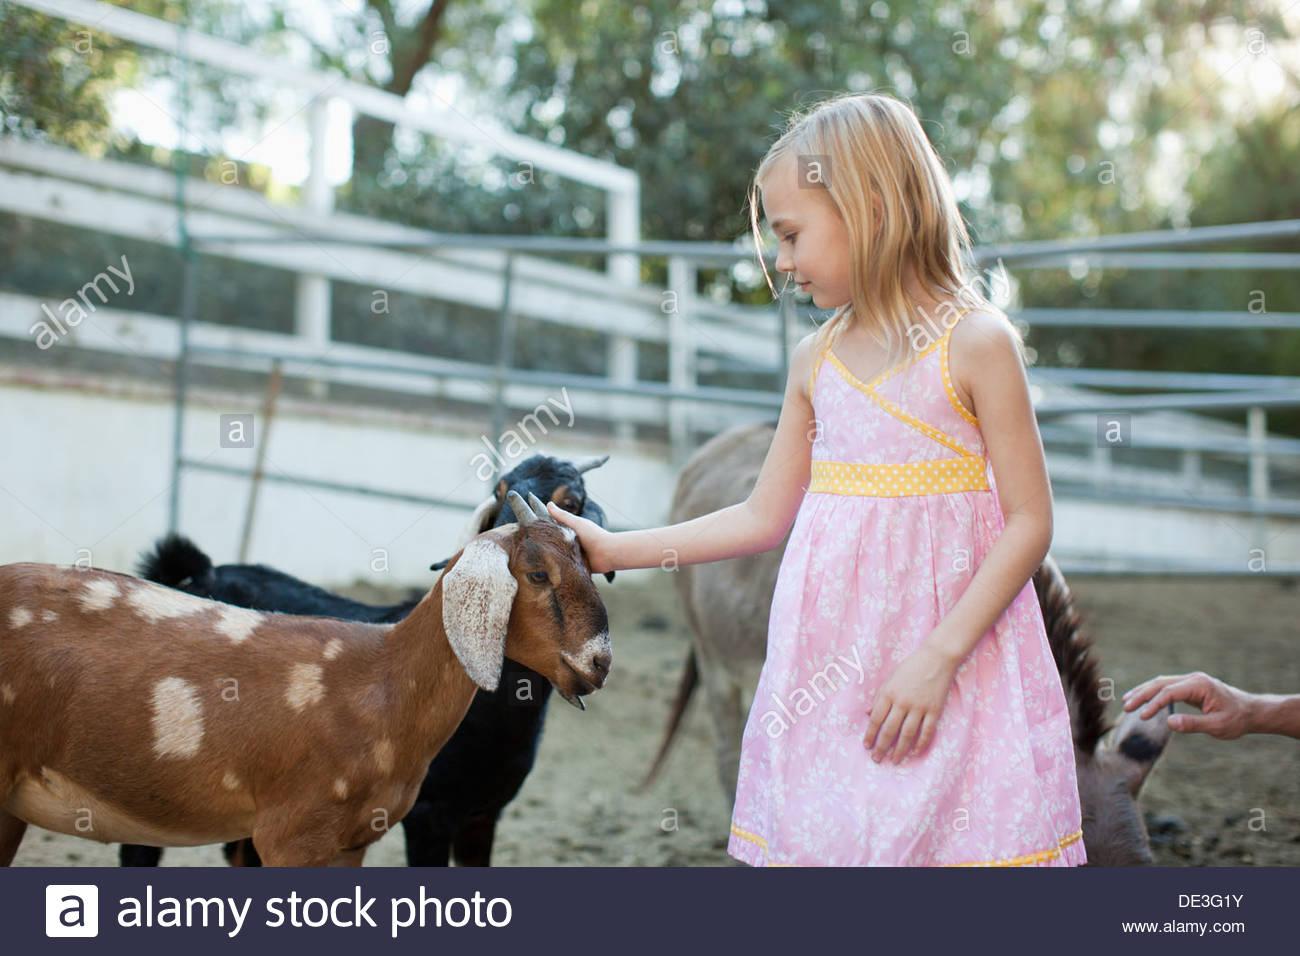 Girl petting goat - Stock Image